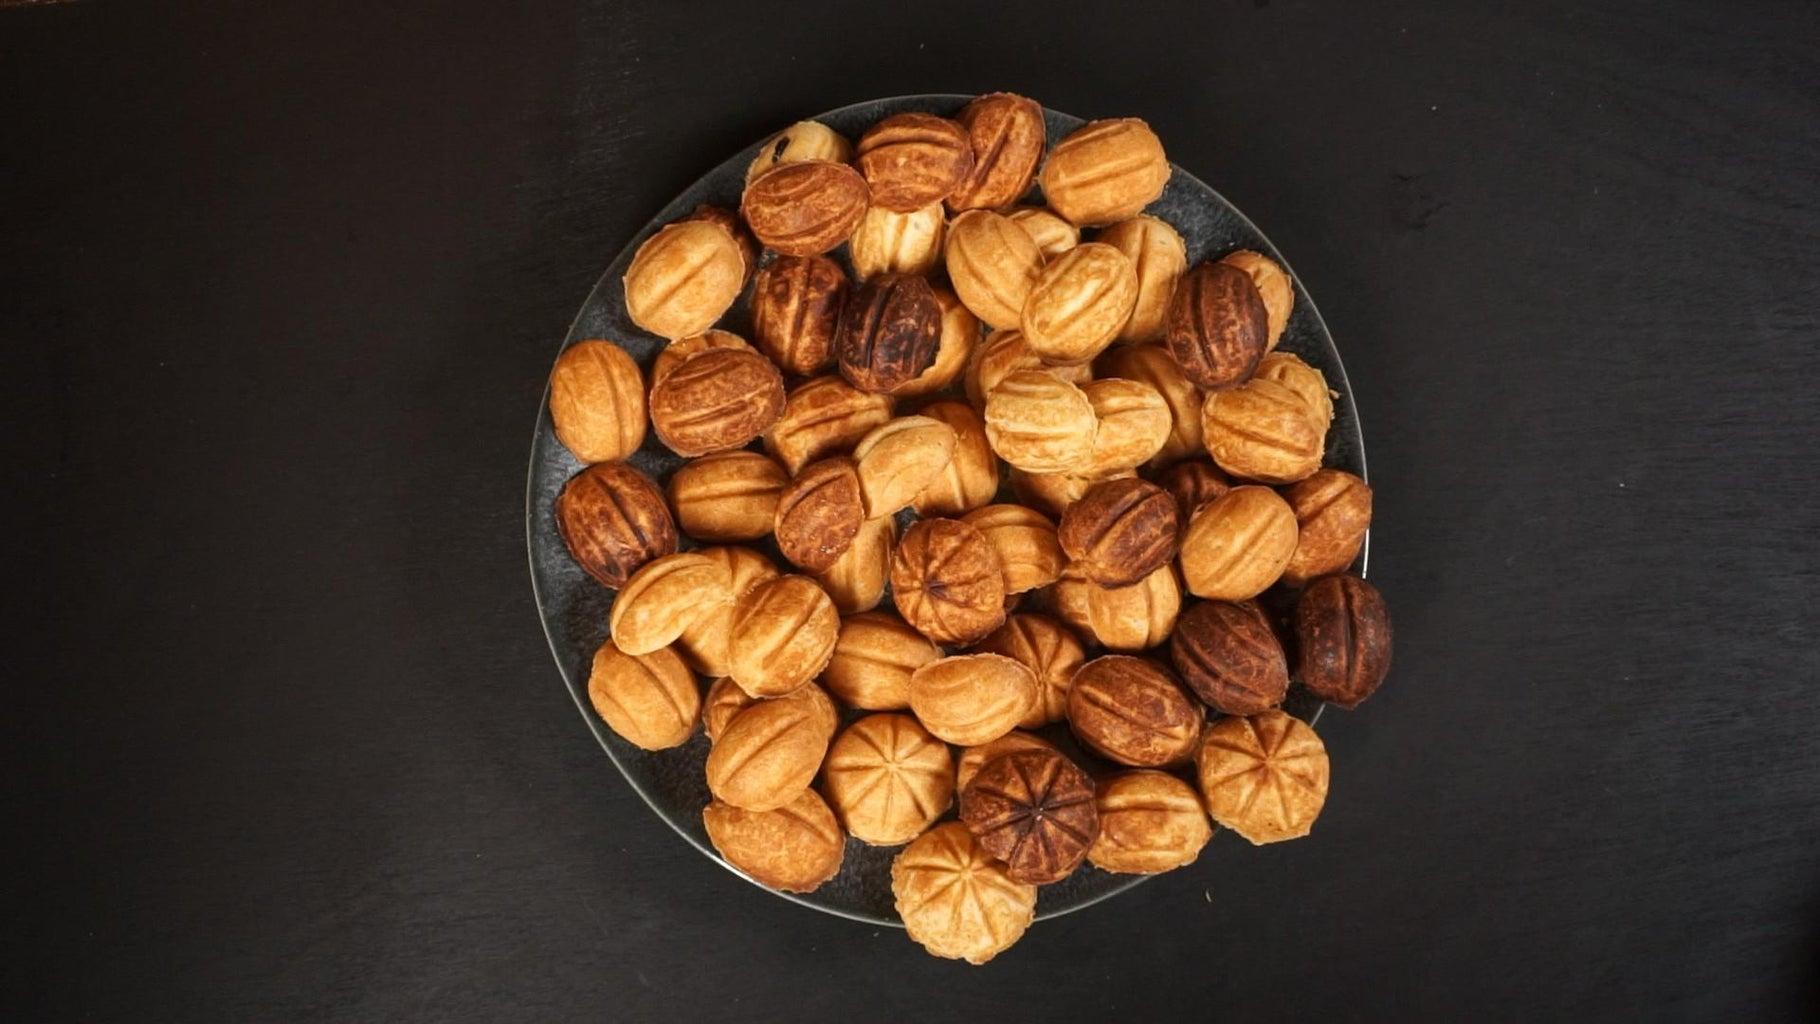 Walnut-Shaped Cookies With Homemade Dulce De Leche